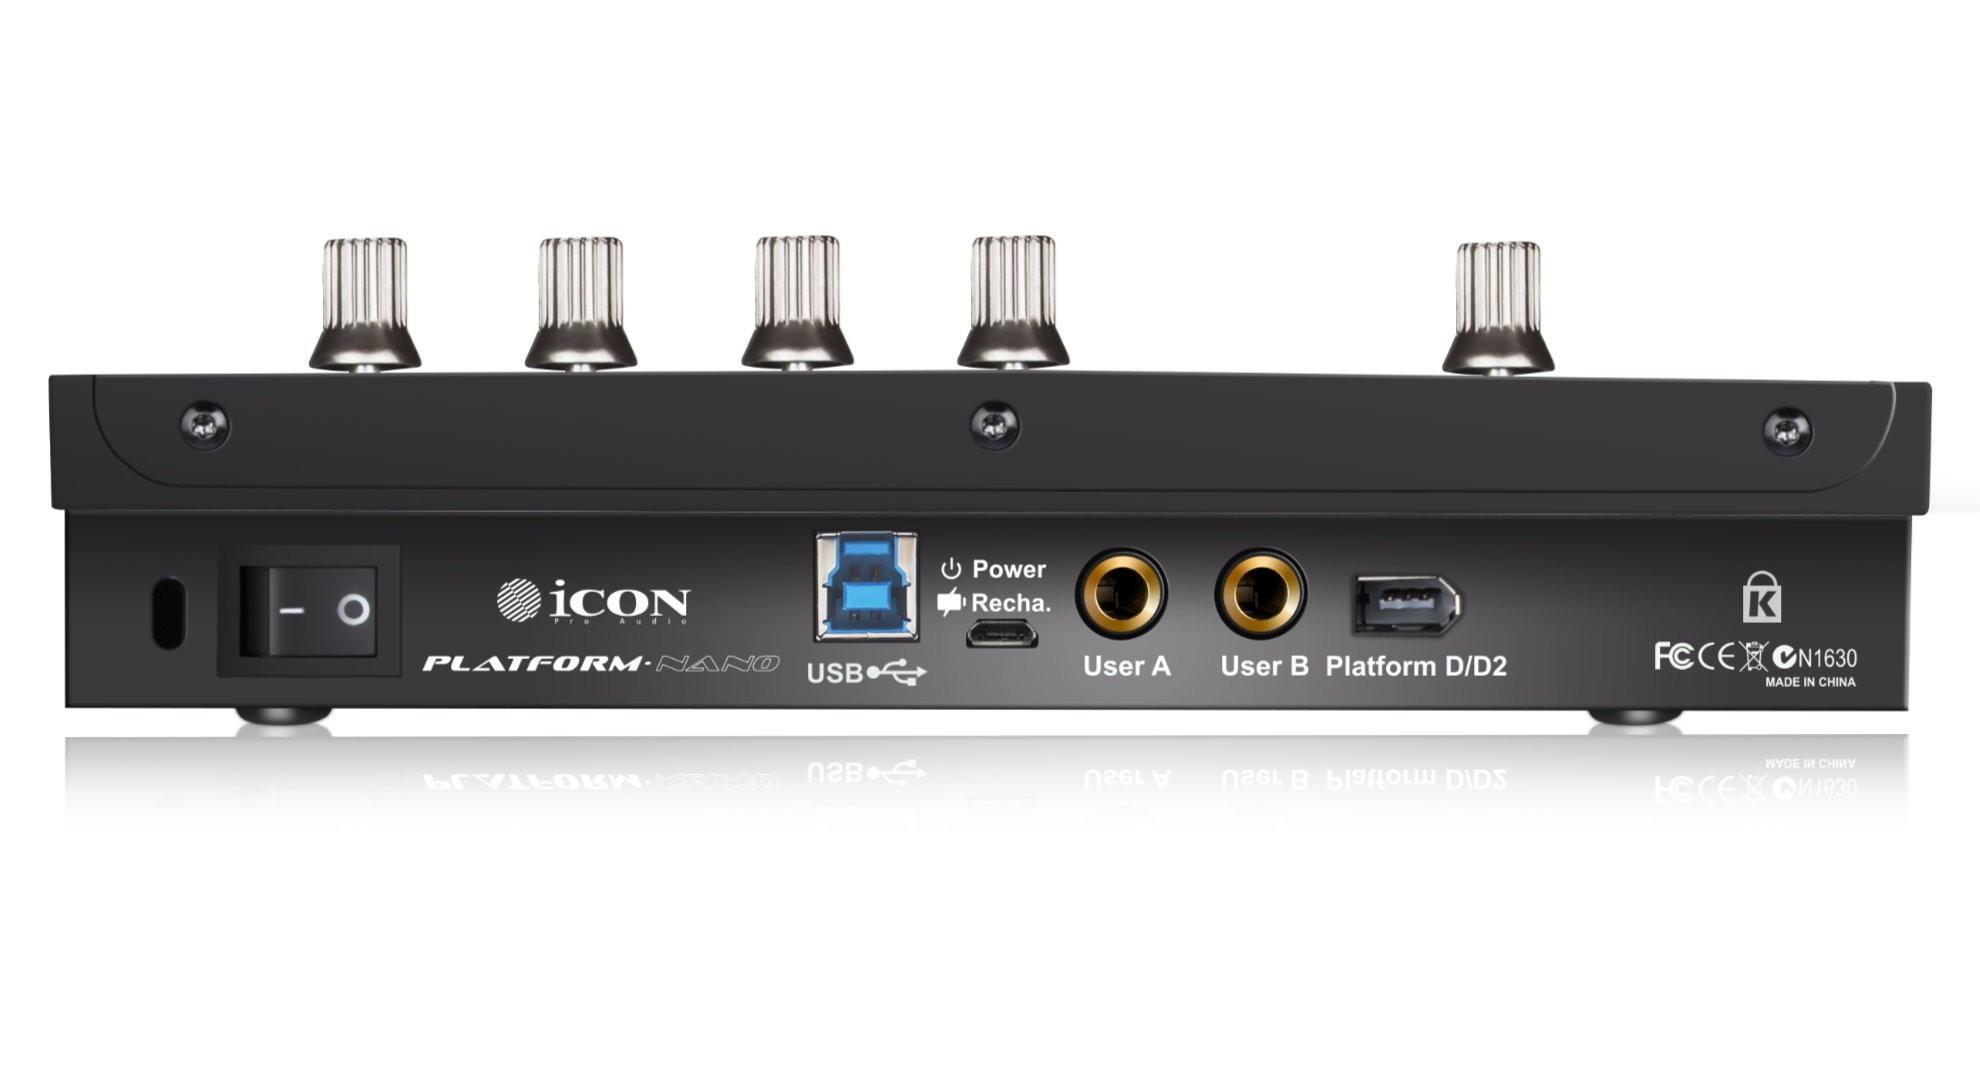 Icon Platform Nano Rear.jpg